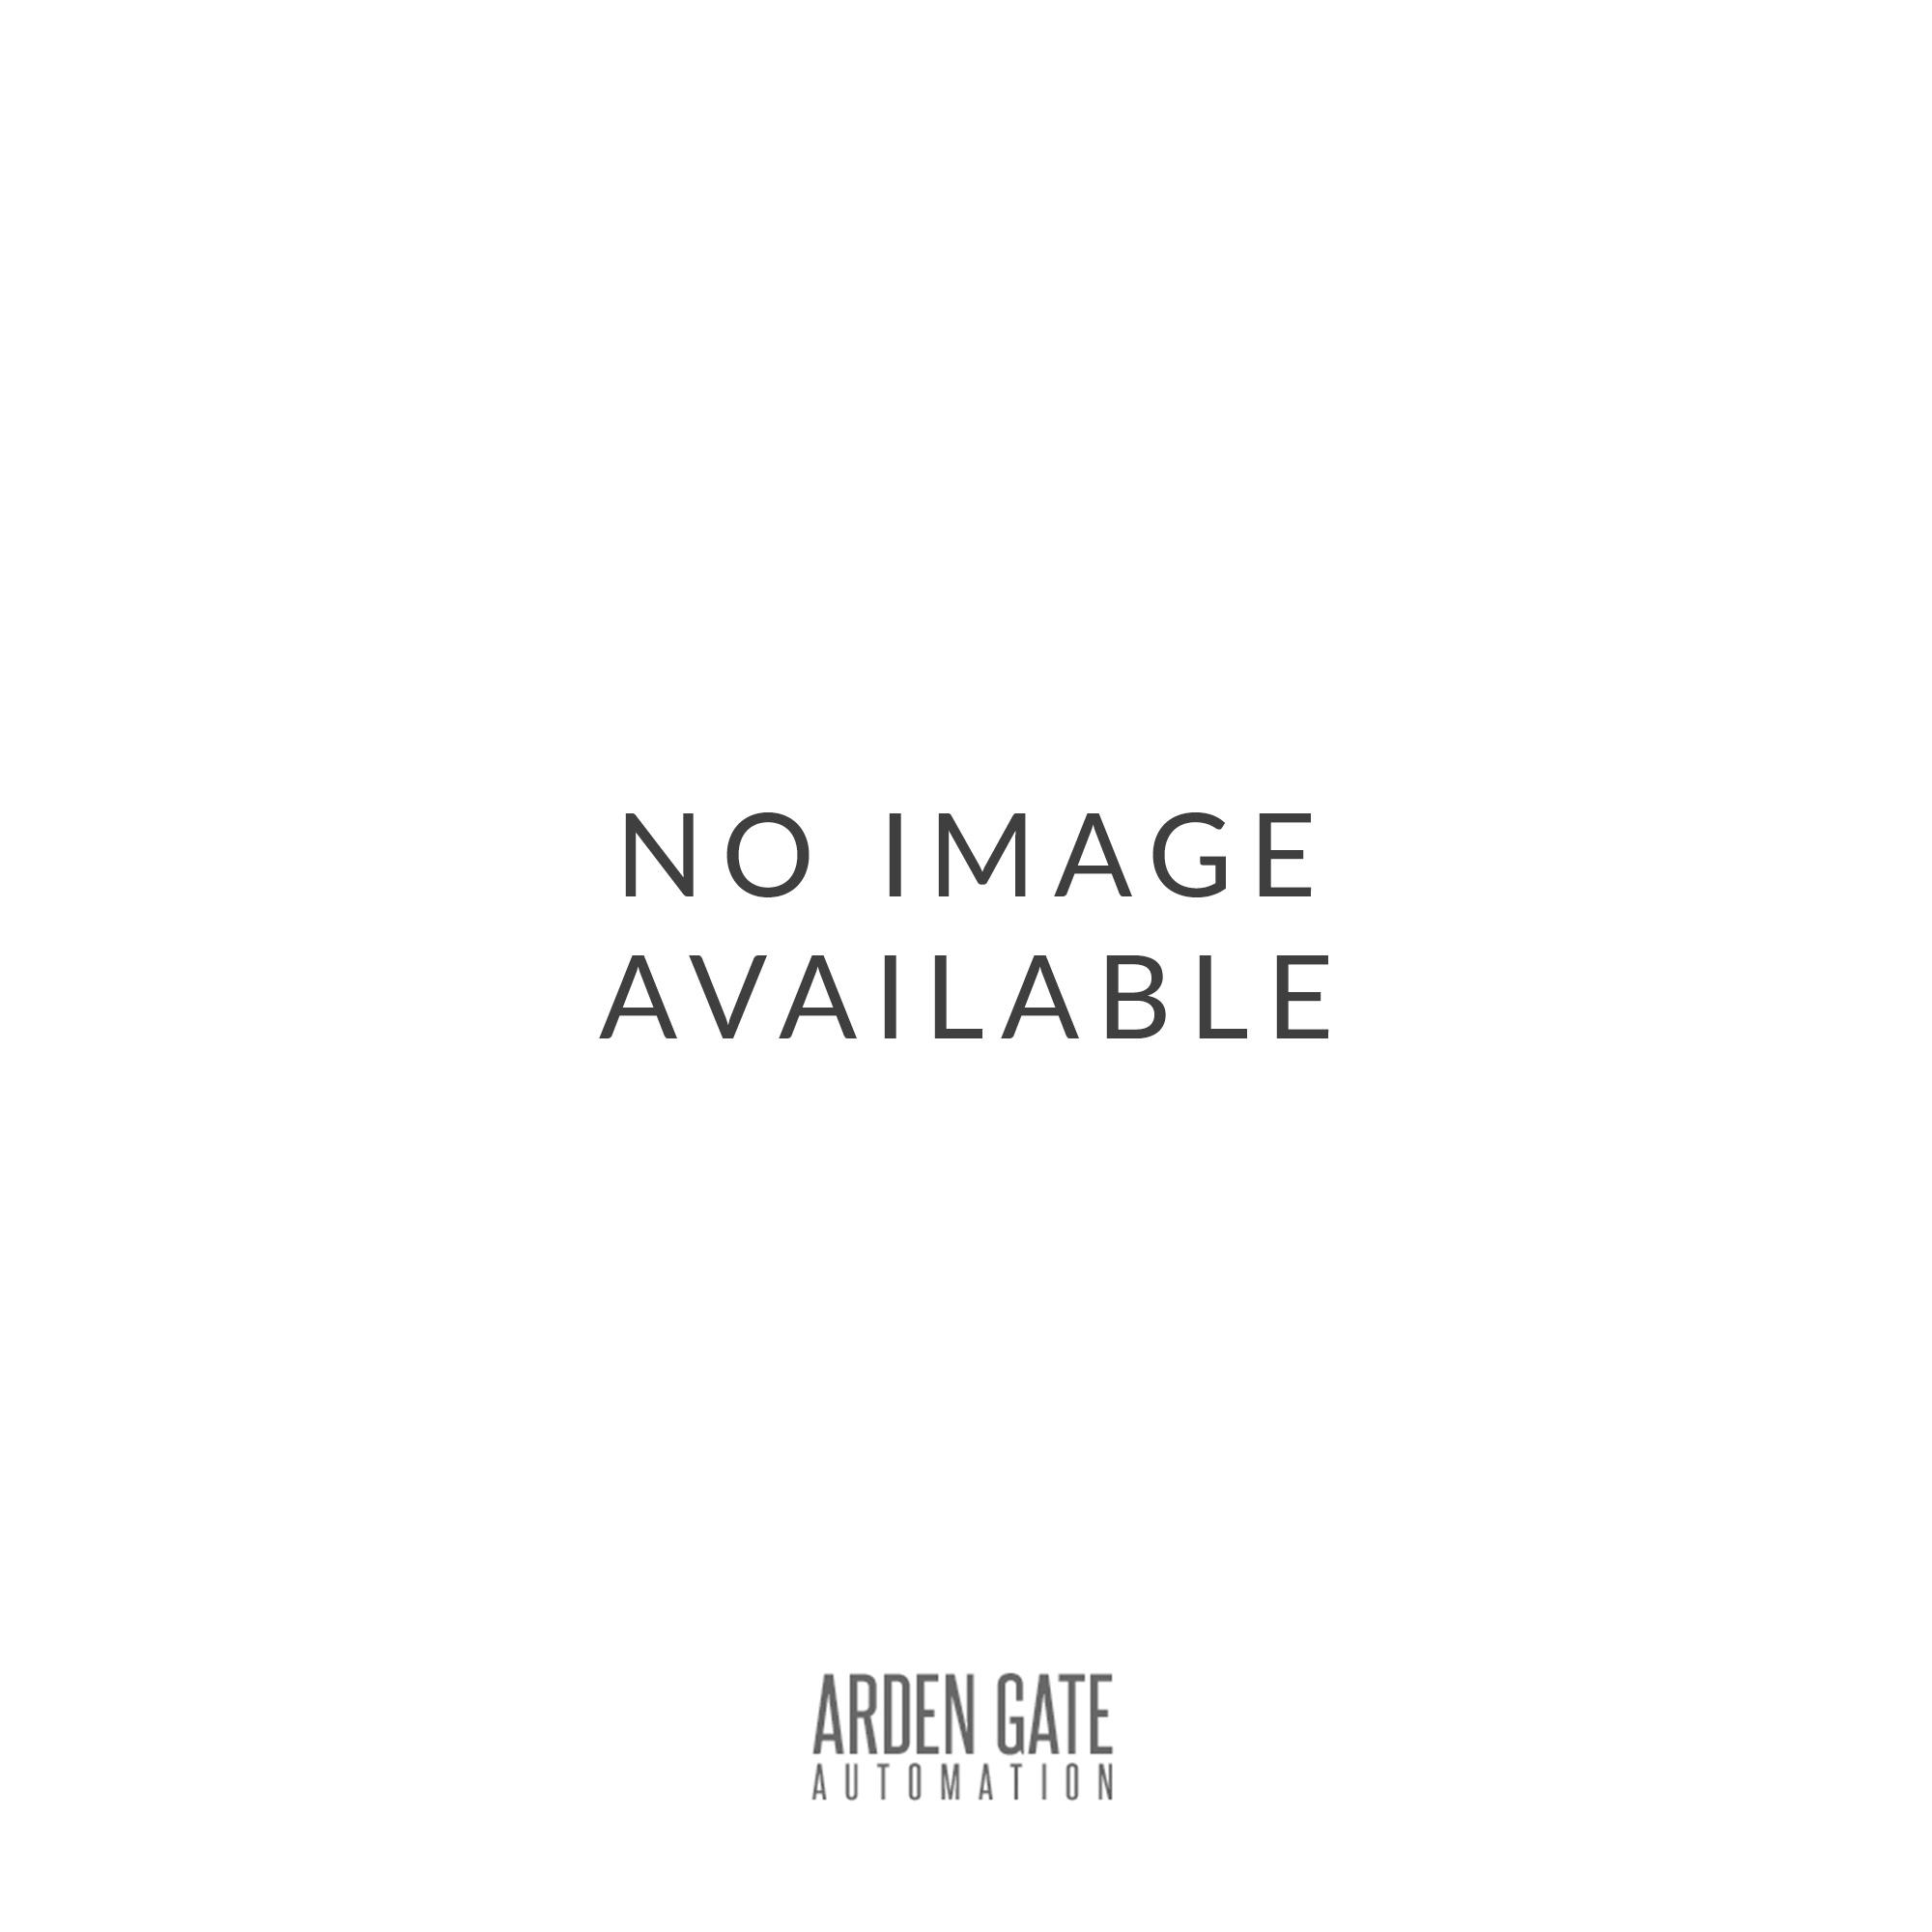 FAAC 415 UK KIT electro mechanical operator double kit for swing gates